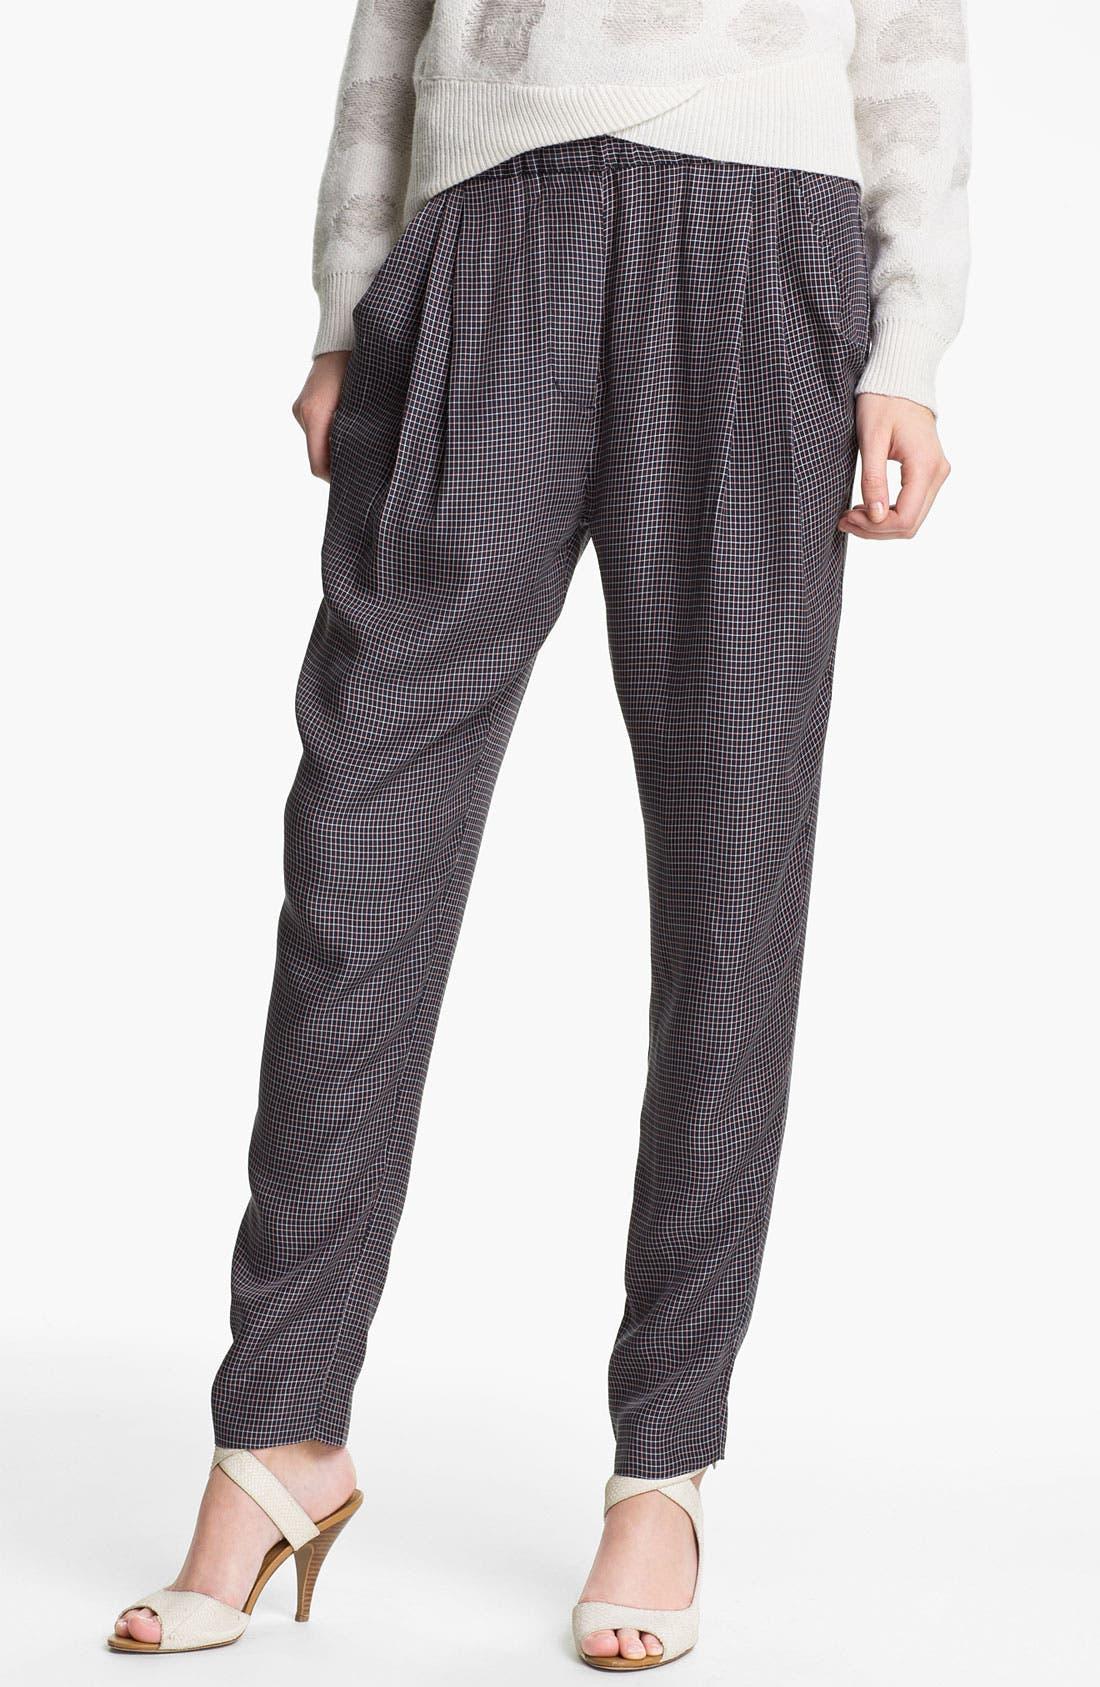 Main Image - 3.1 Phillip Lim Check Print Draped Trousers